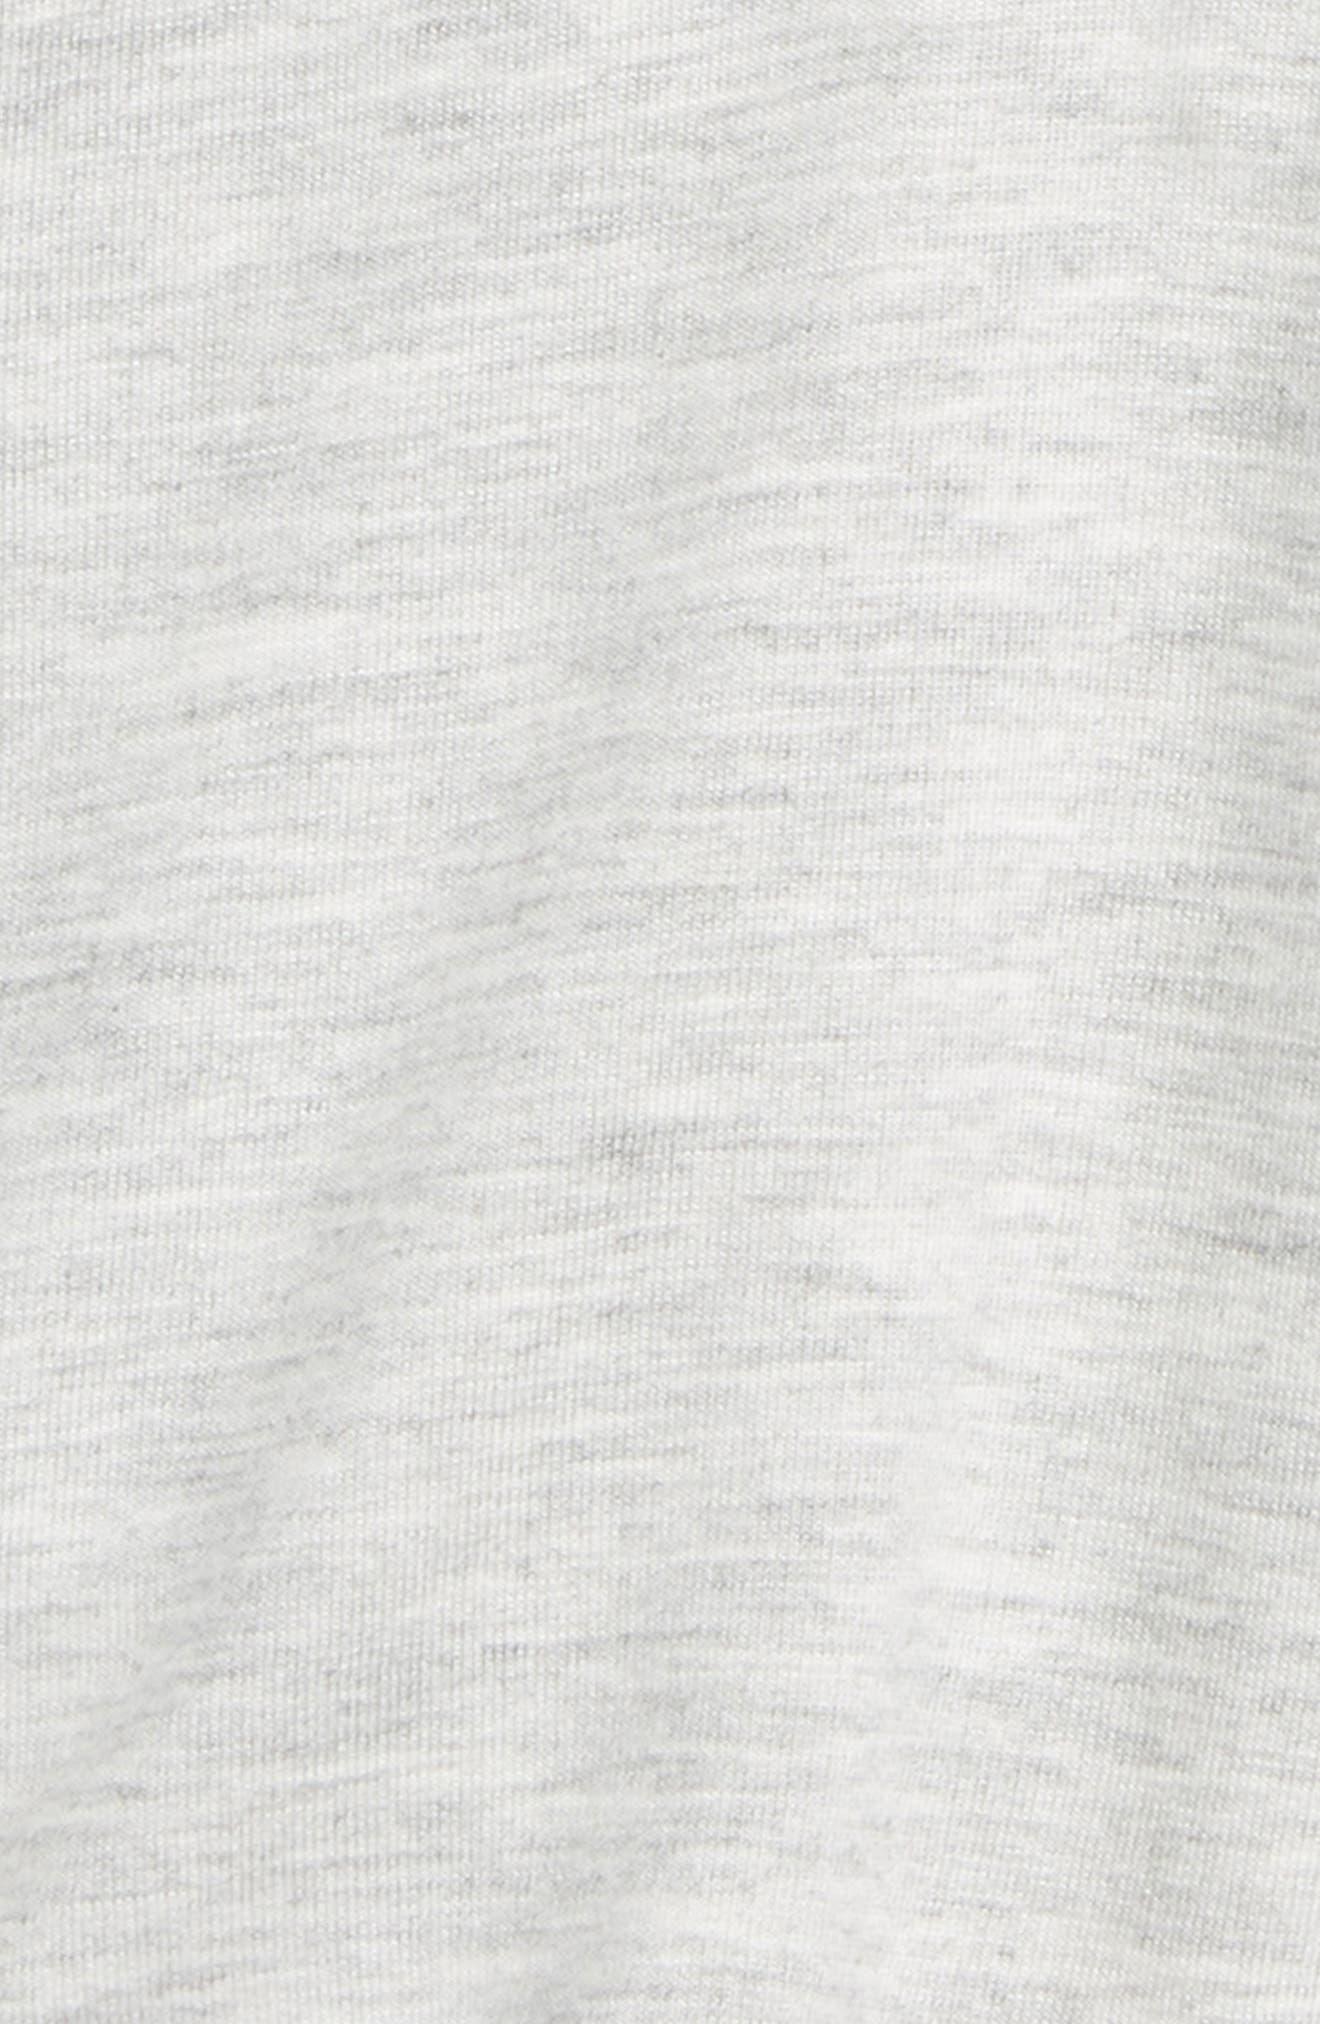 Scotch R'Belle The Pool Side Shorts,                             Alternate thumbnail 2, color,                             606 Grey Mel